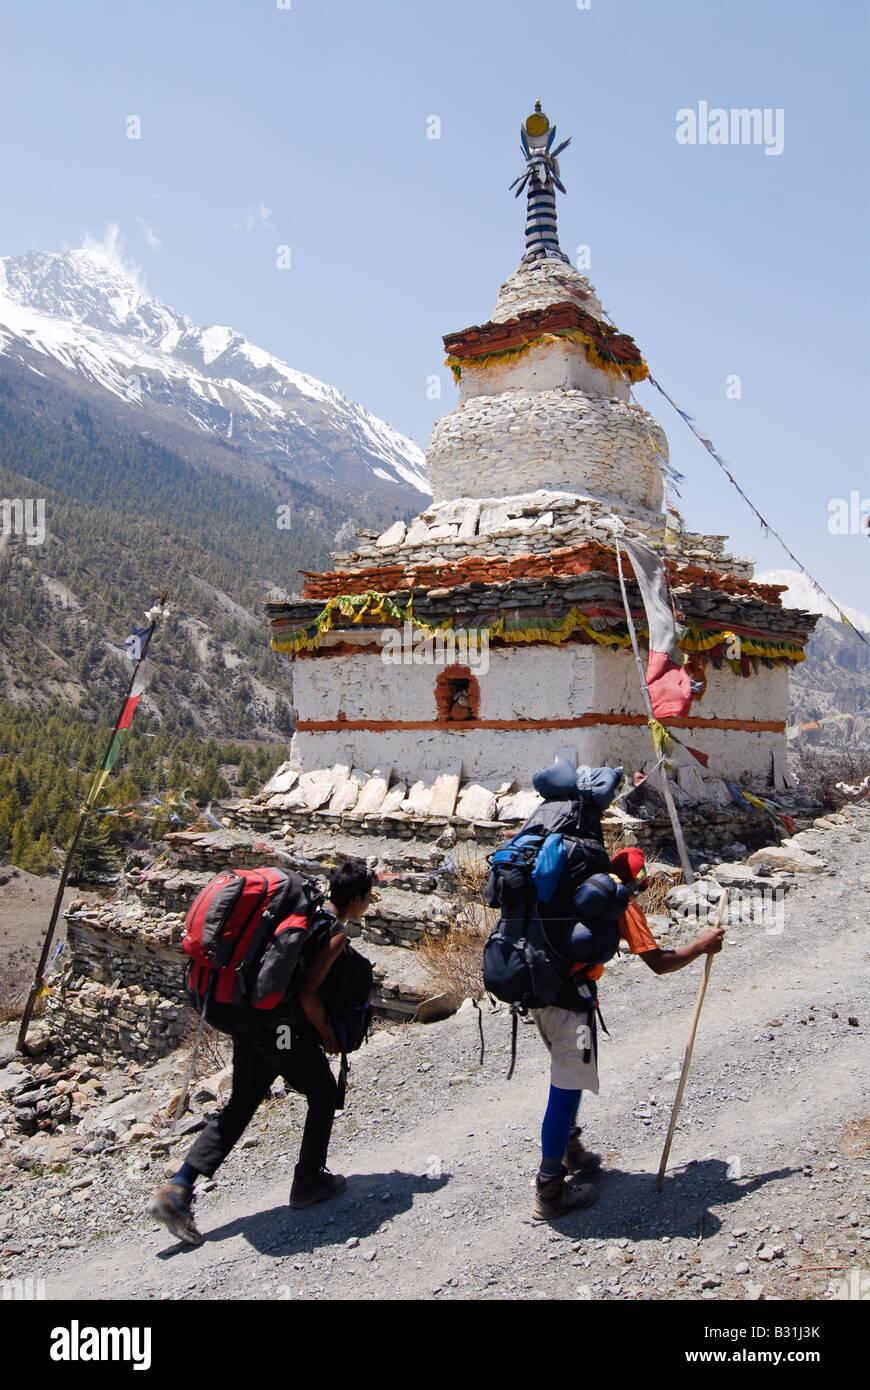 Two trekkers walk past a buddhist stupa on the Annapurana curcuit, Himalaya trekking, Nepal - Stock Image